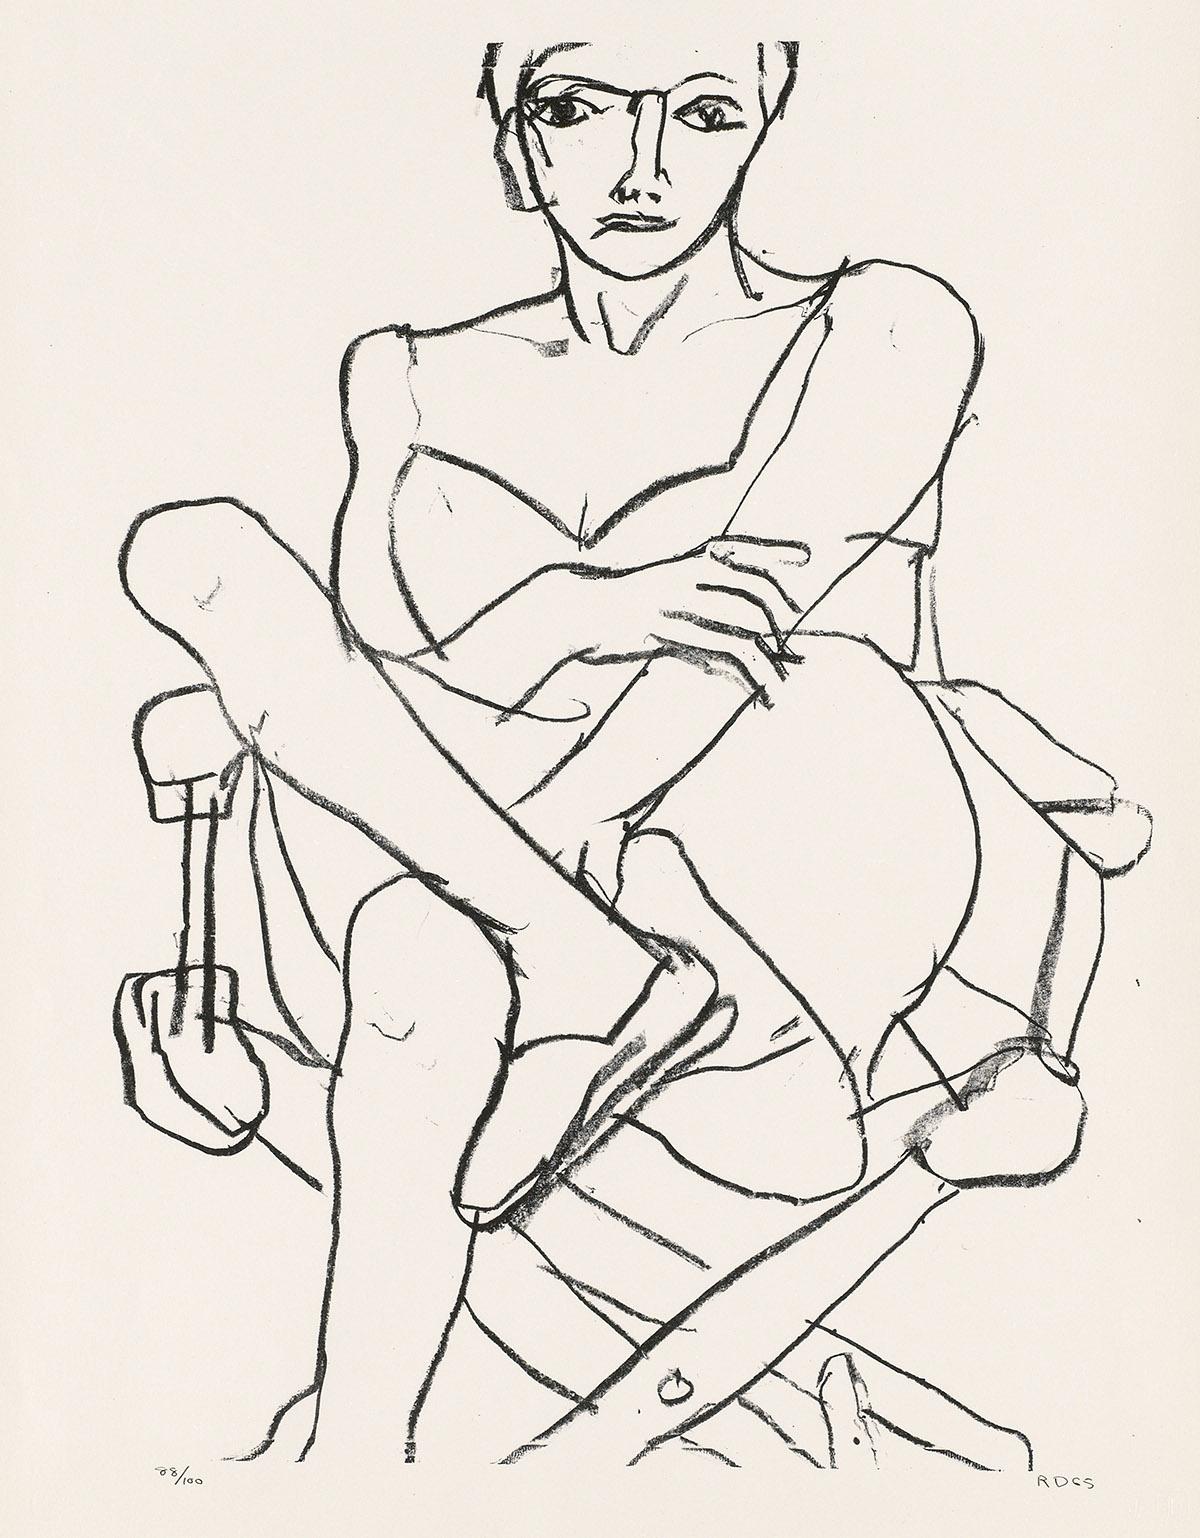 RICHARD-DIEBENKORN-Seated-Woman-in-Chemise